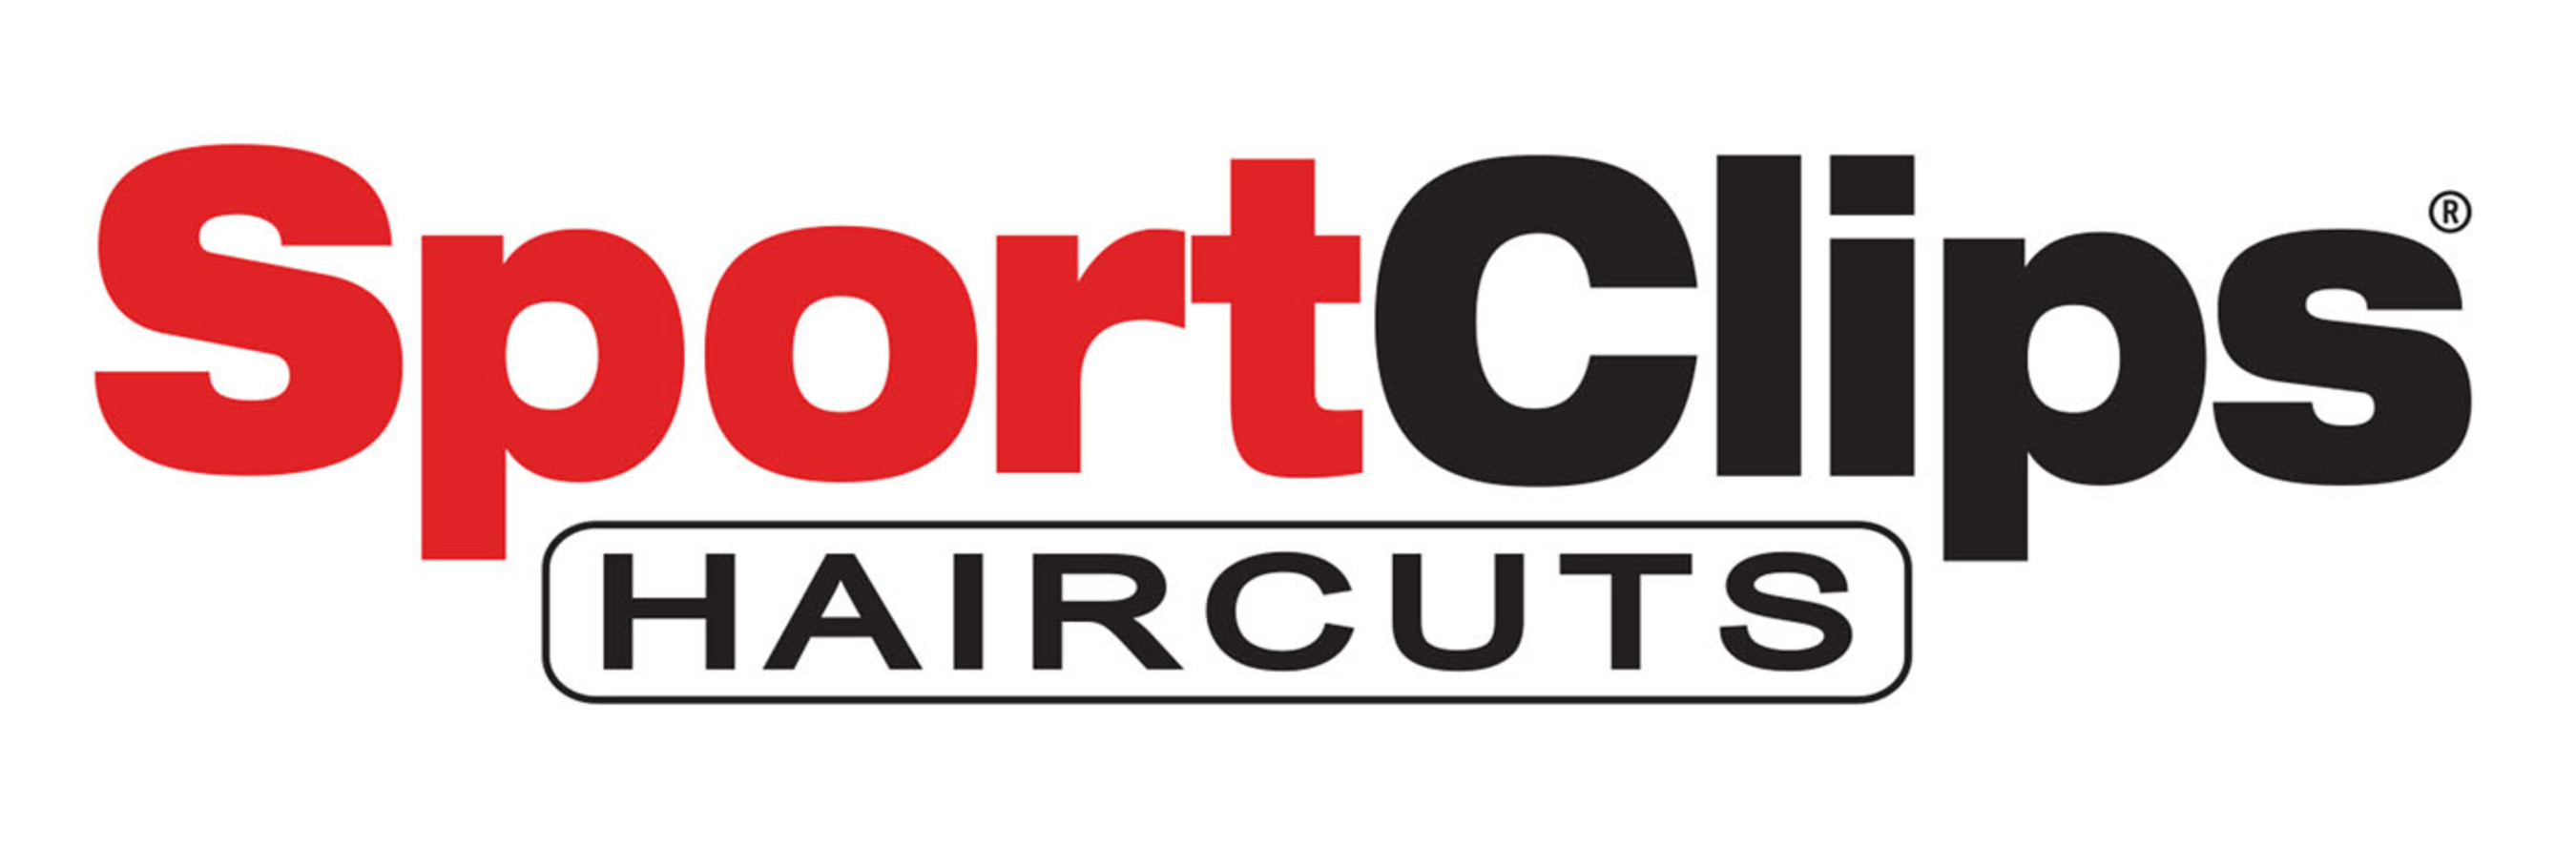 Sport Clips Haircuts.